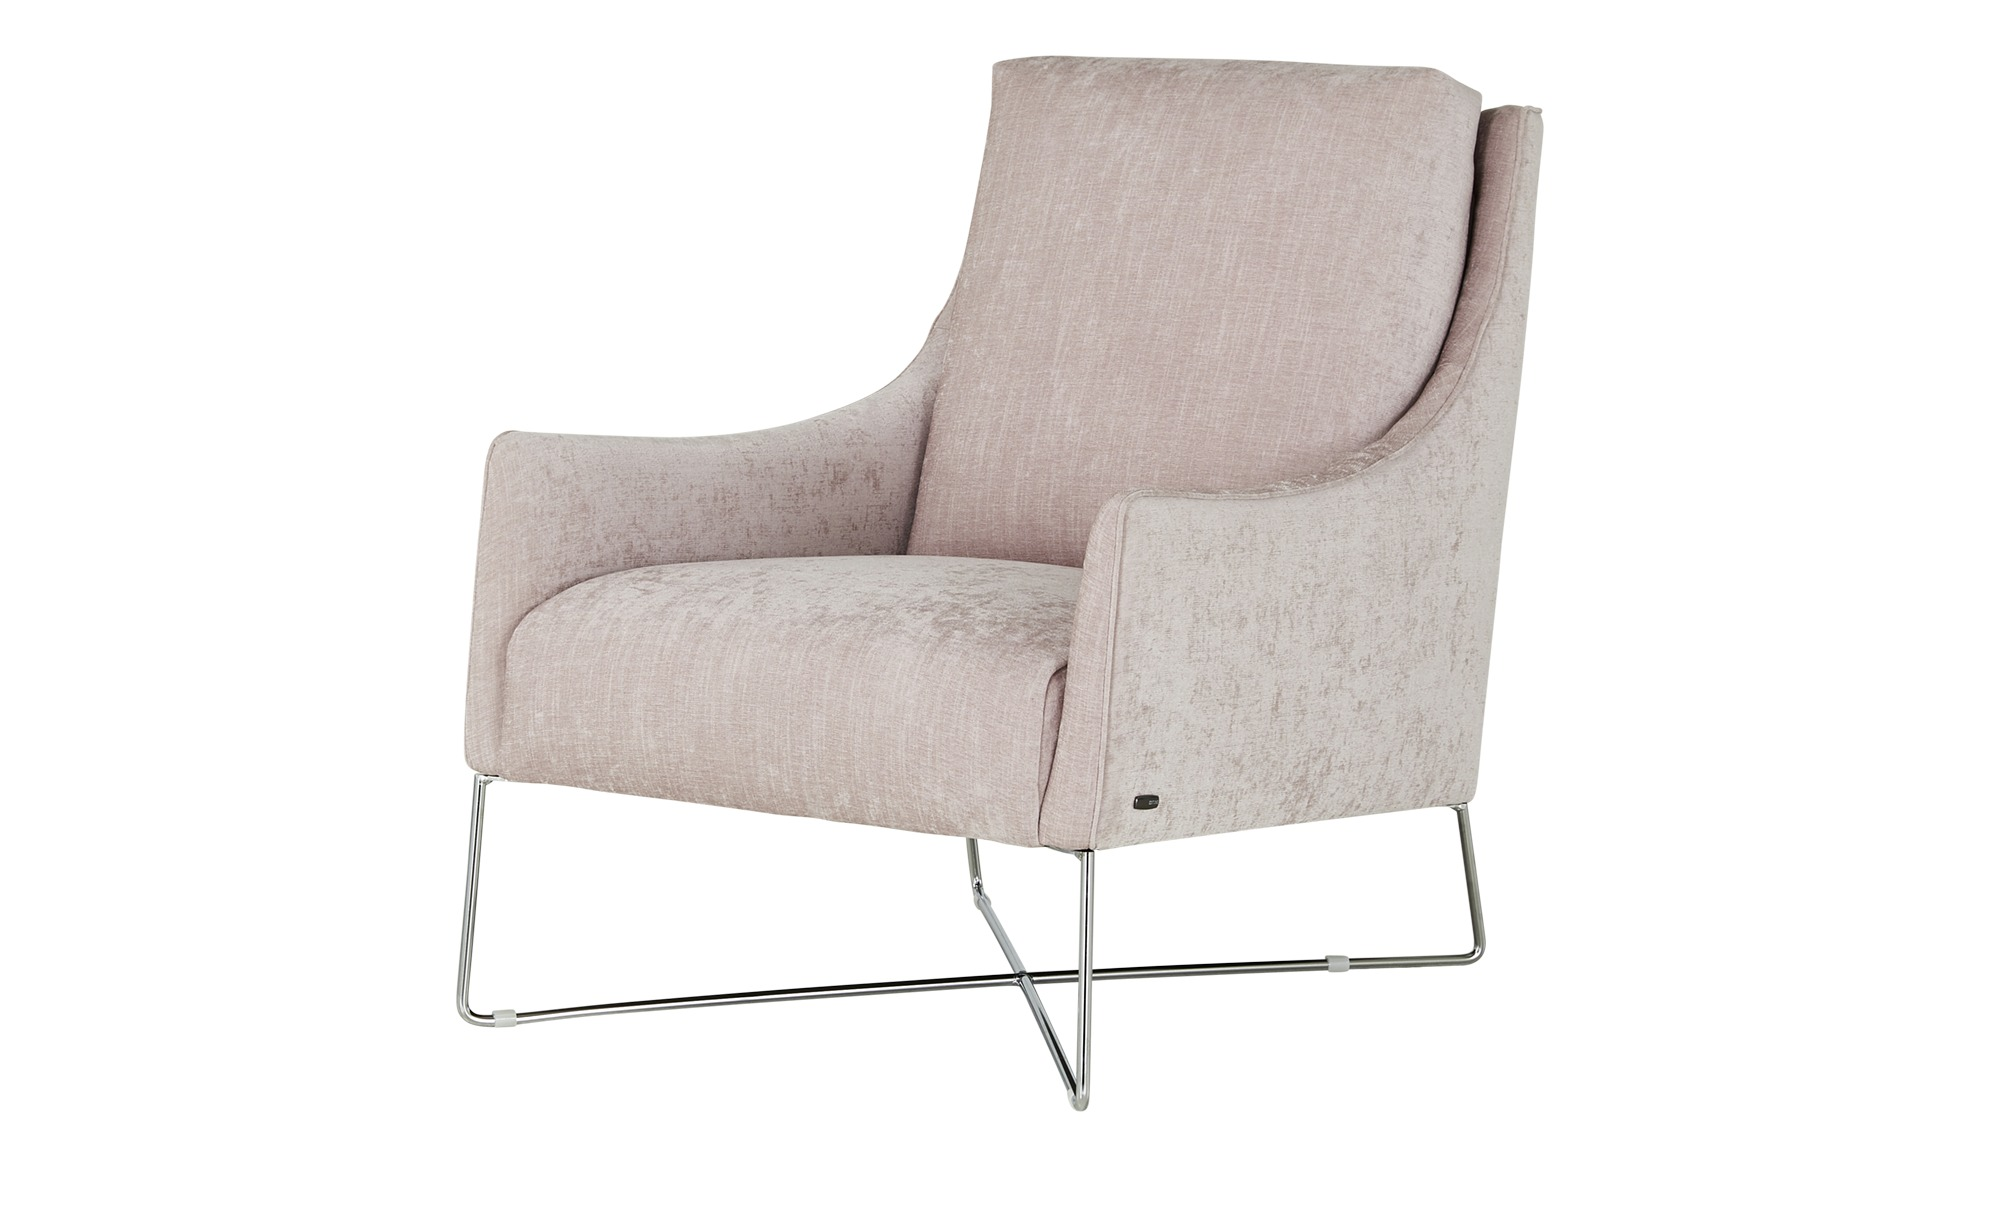 Natuzzi Editions Sessel  Regina ¦ rosa/pink ¦ Maße (cm): B: 69 H: 84 T: 89 Polstermöbel > Sessel > Polstersessel - Höffner